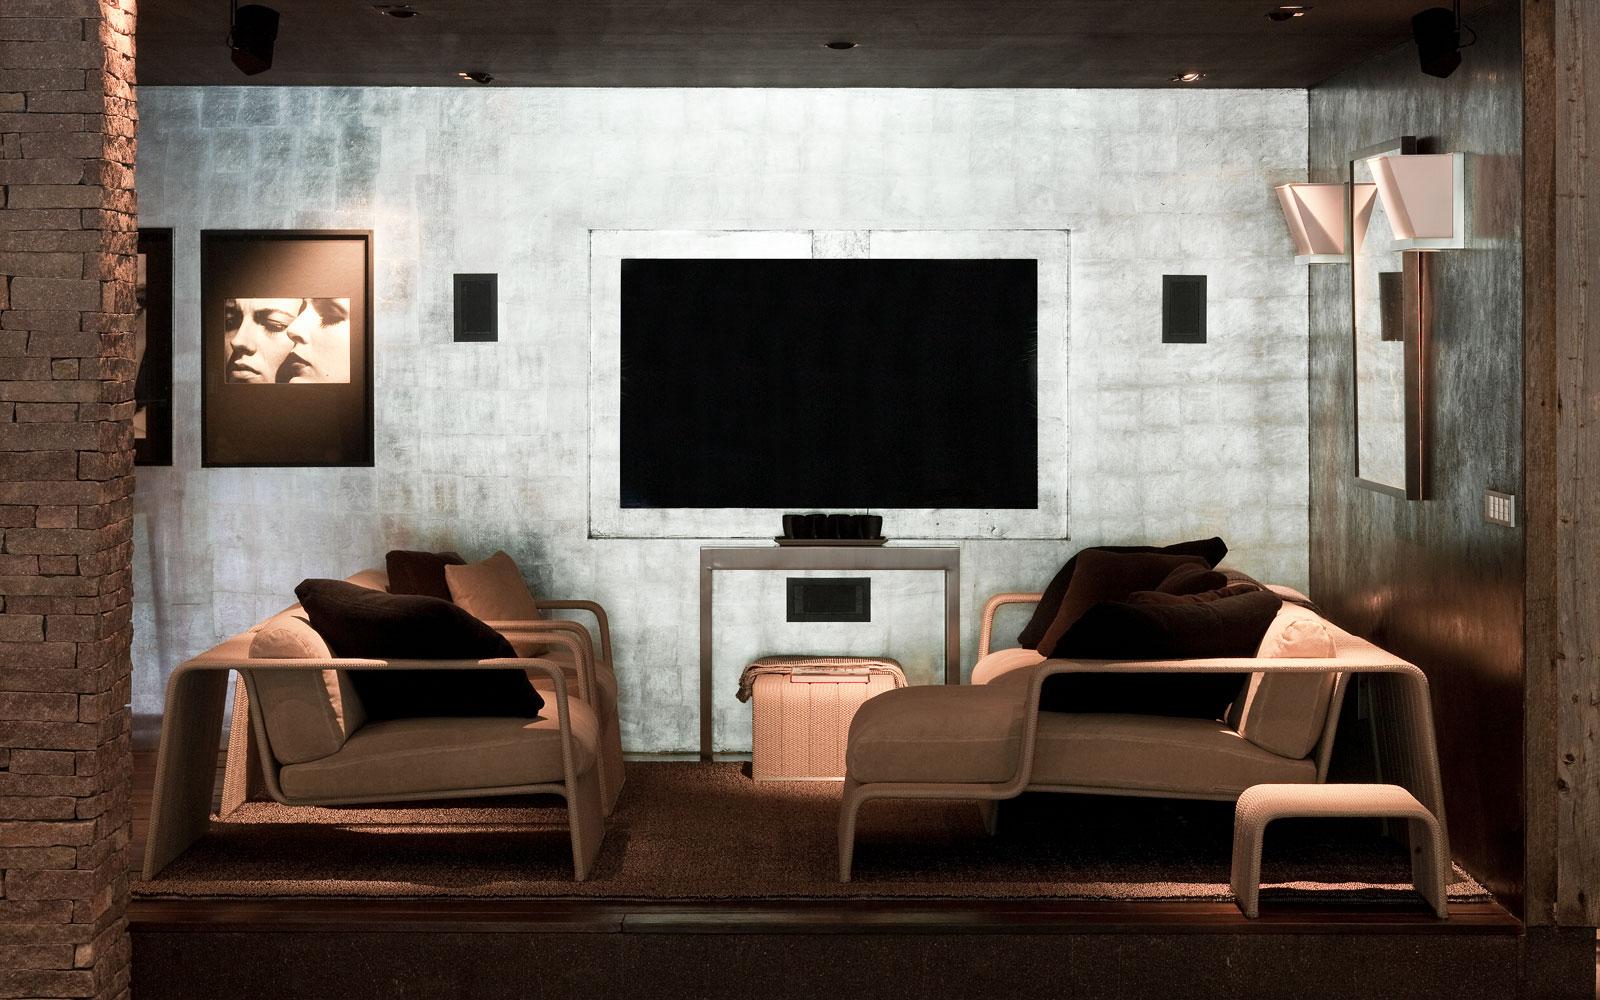 Lounge, loungehoek, televisie, wellness, souterrain, riante villa, Leeflang Architectuur